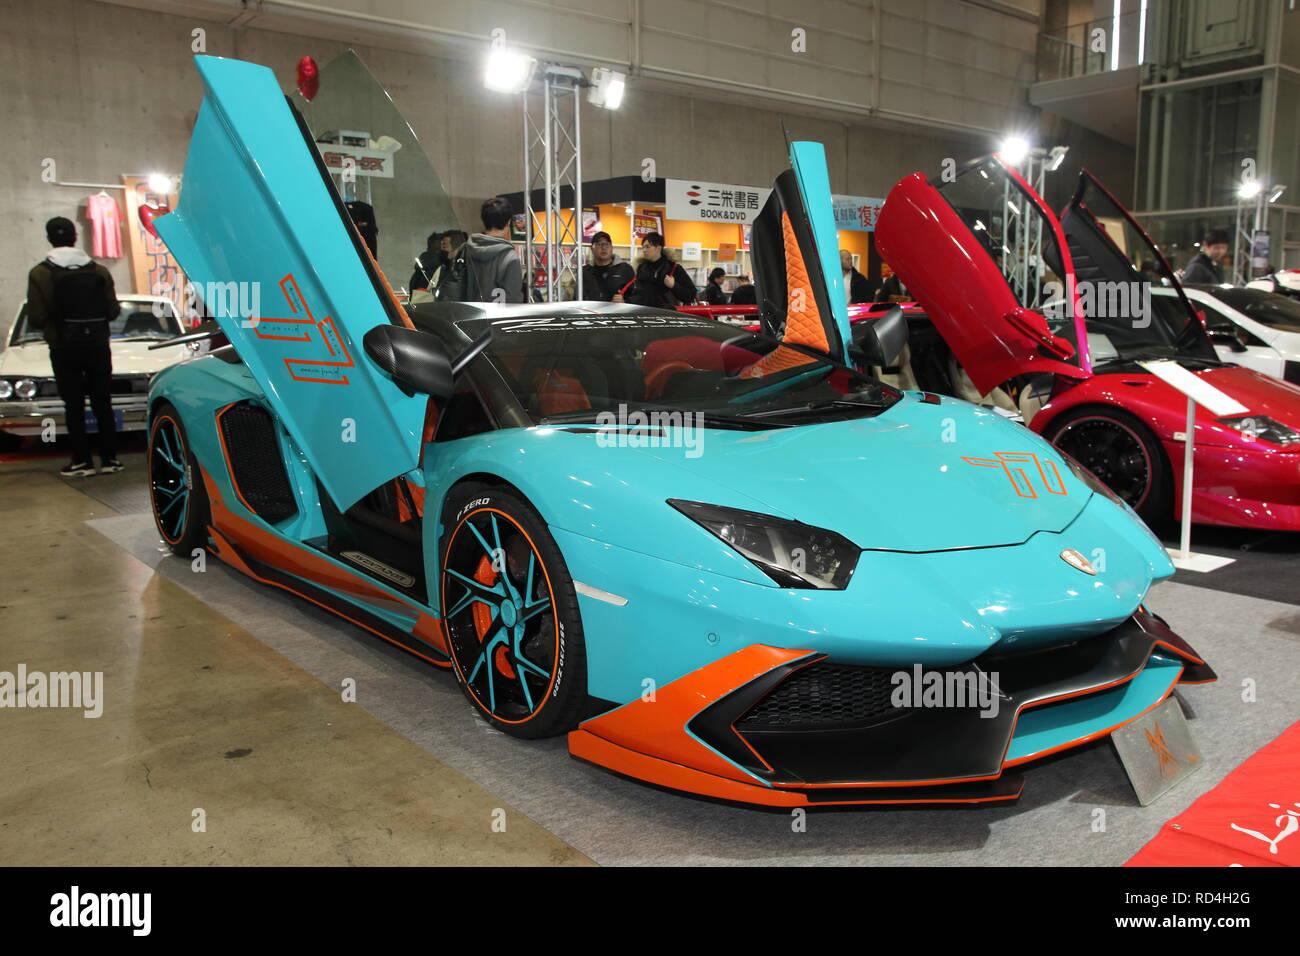 Friday 11th Jan 2019 A Custom Lamborghini Aventador Is Displayed